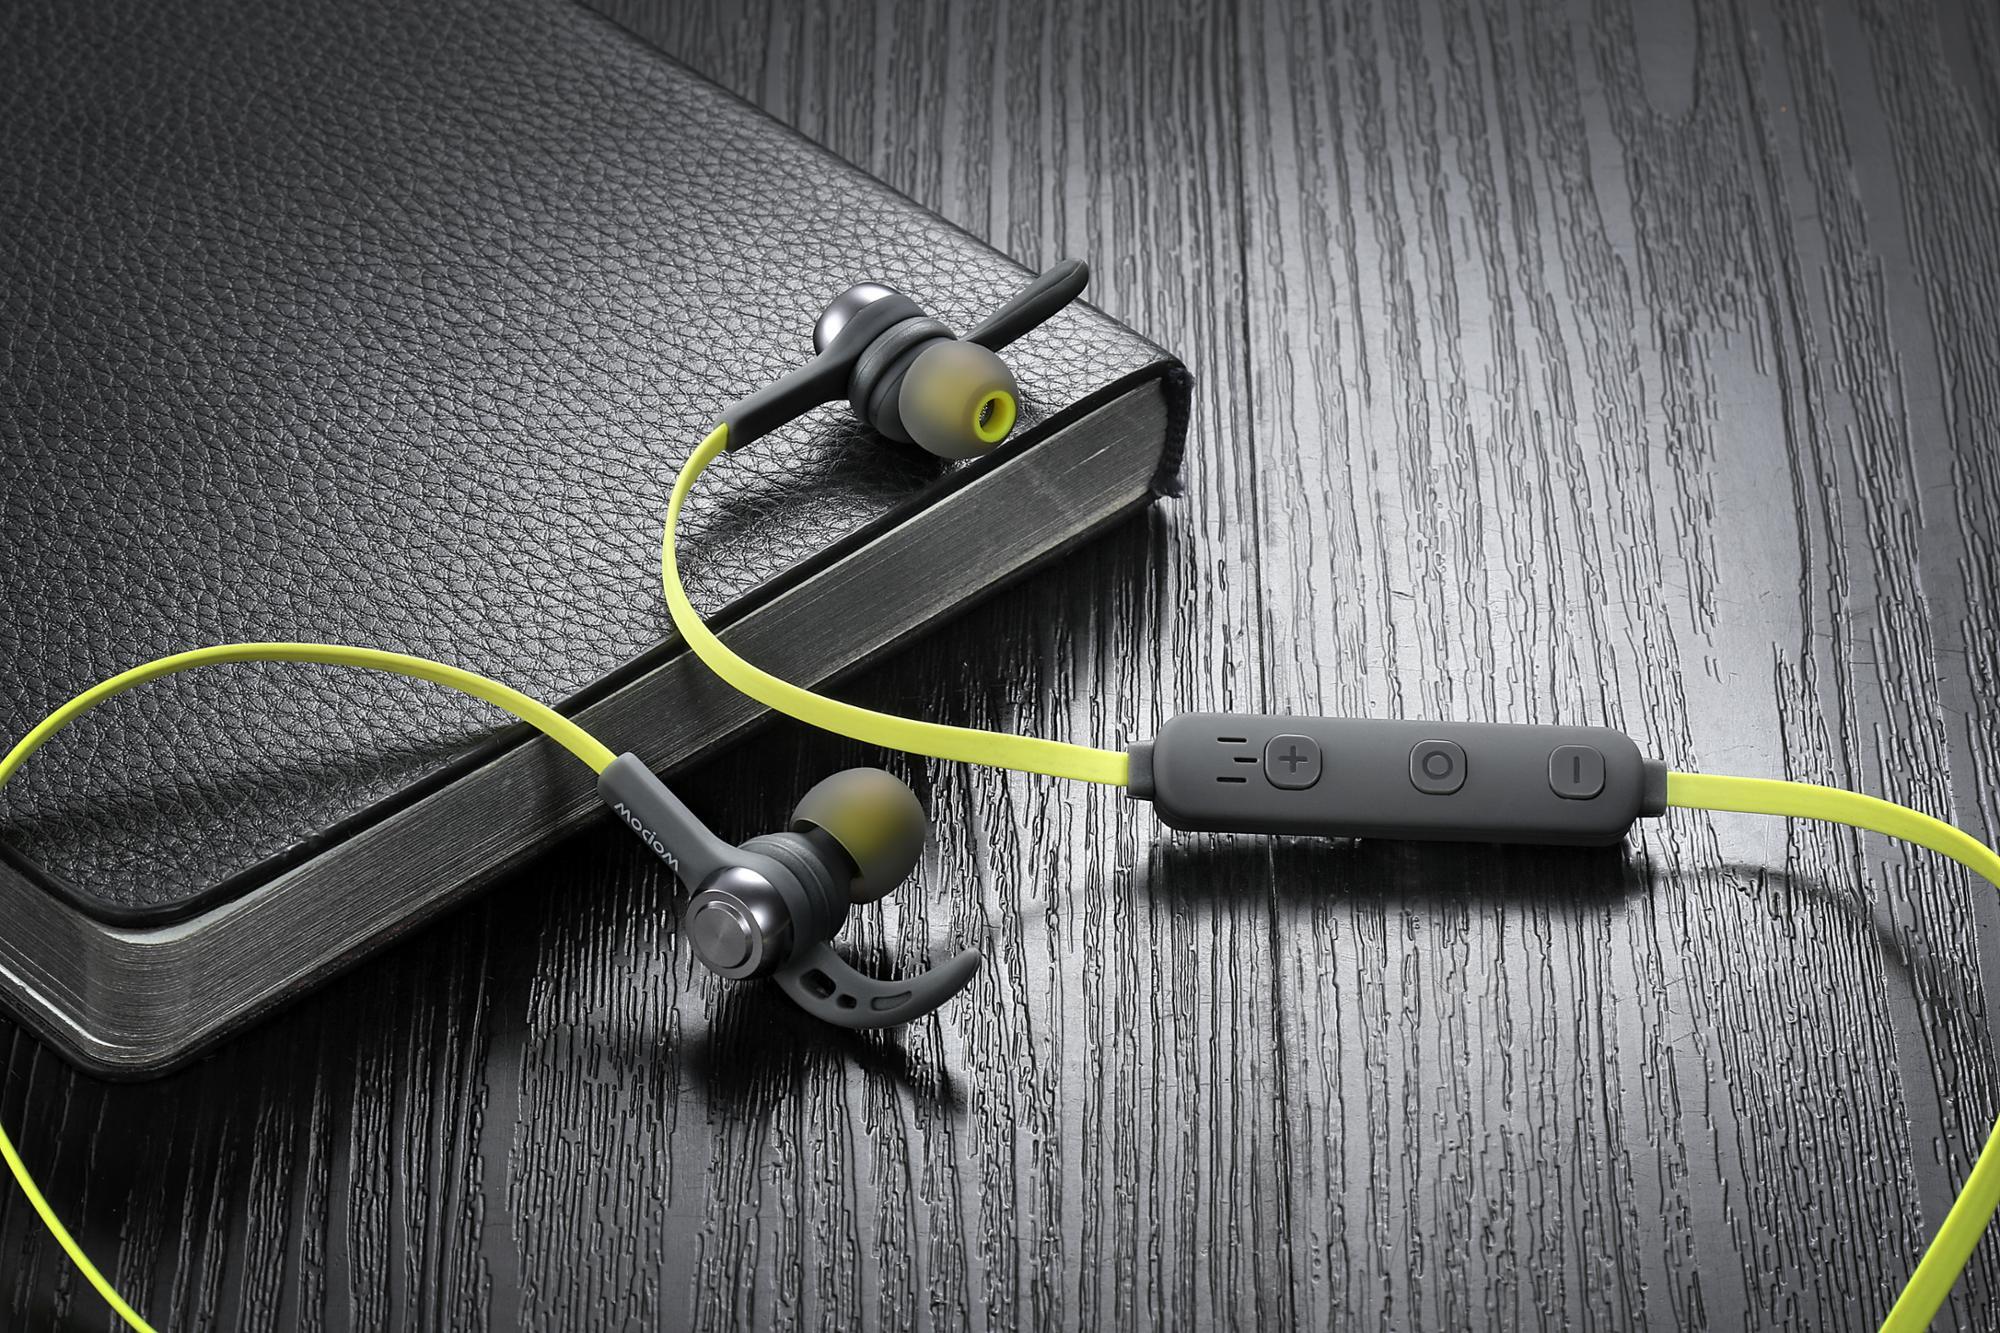 Wopowกีฬาไร้สายหูฟังสเตอริโอพร้อมไมโครโฟนกันน้ำและเสียงยกเลิกV4.2 + EDRวัสดุโลหะในหูหูฟัง